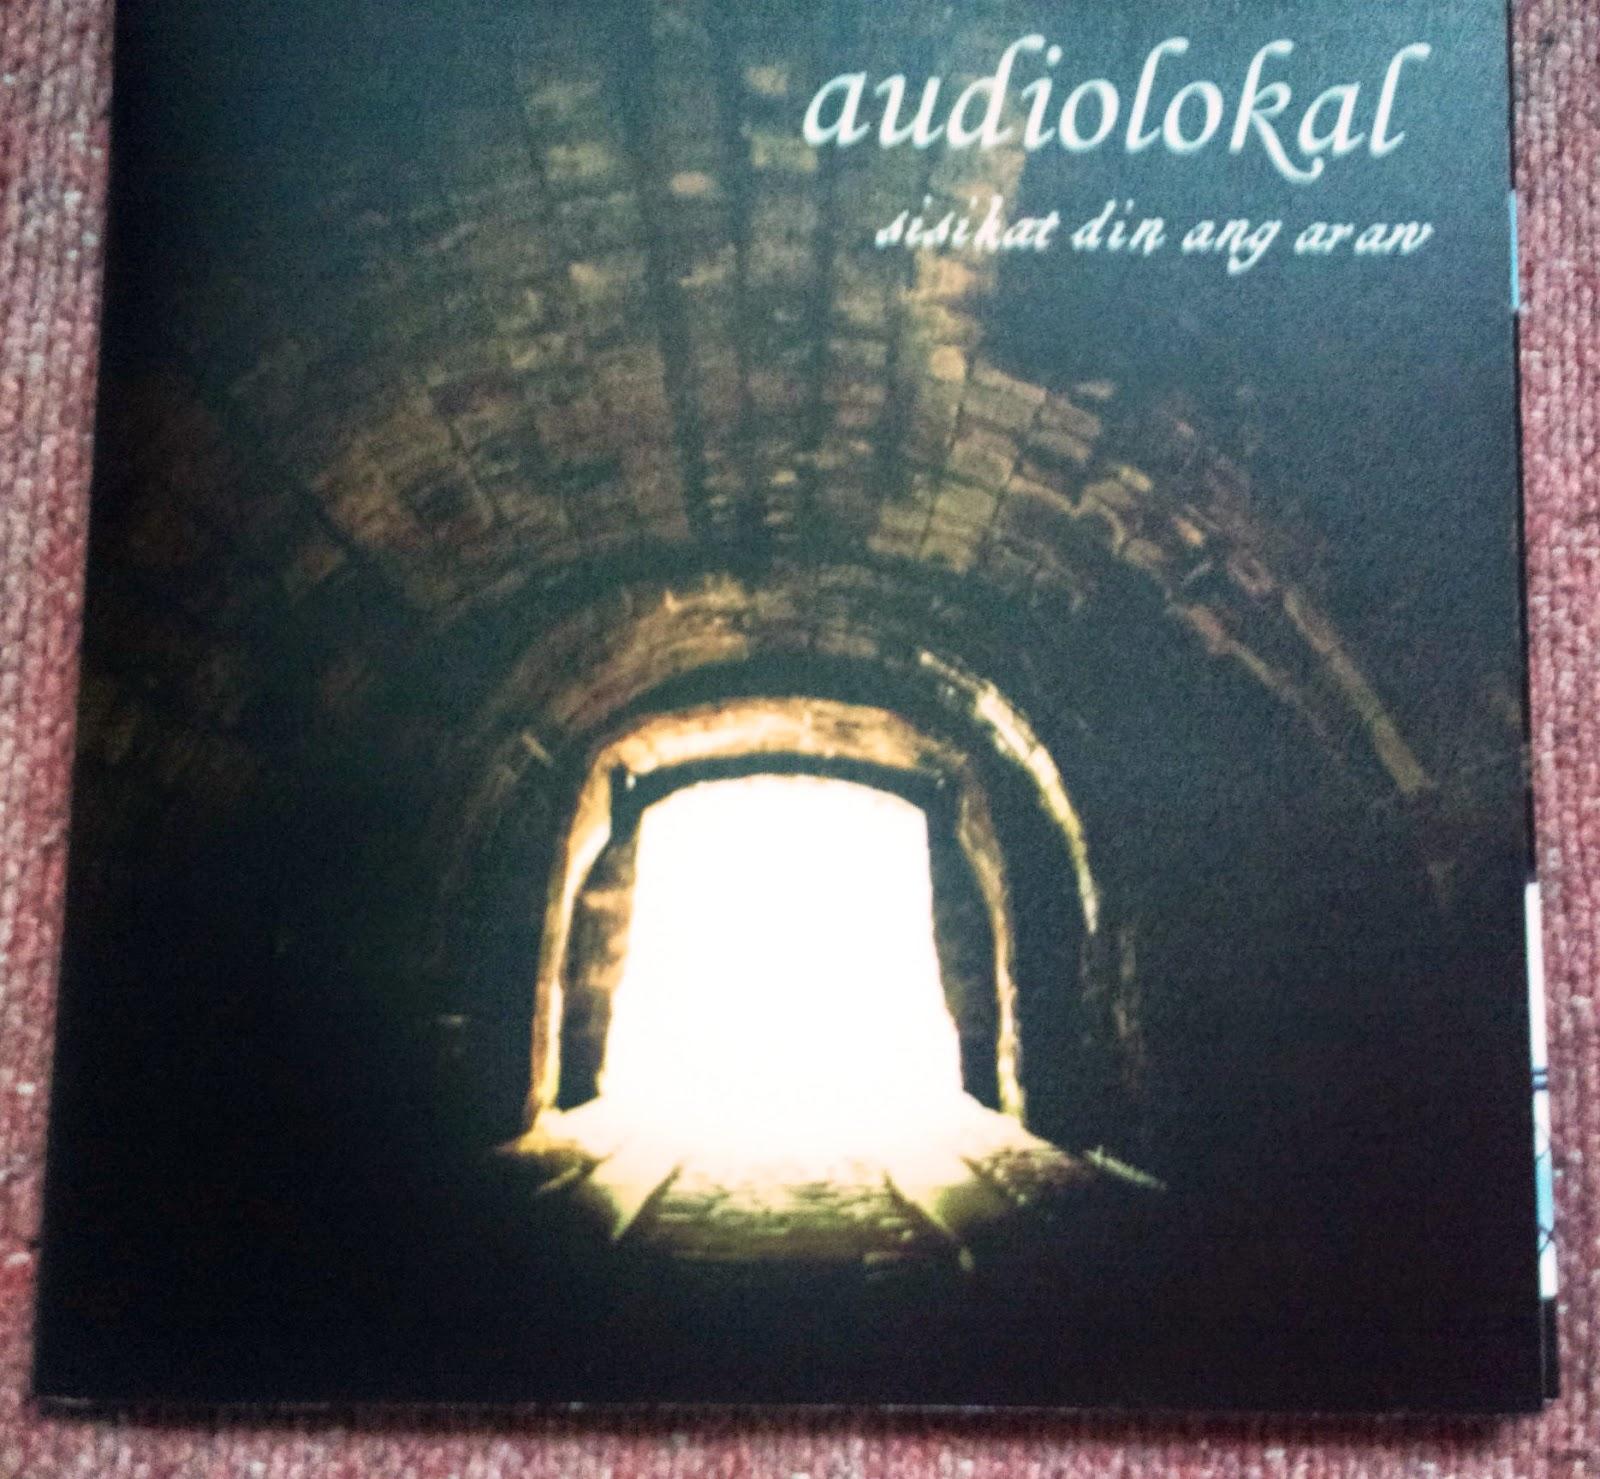 Audiolokal Sisikat din ang Araw Full Album